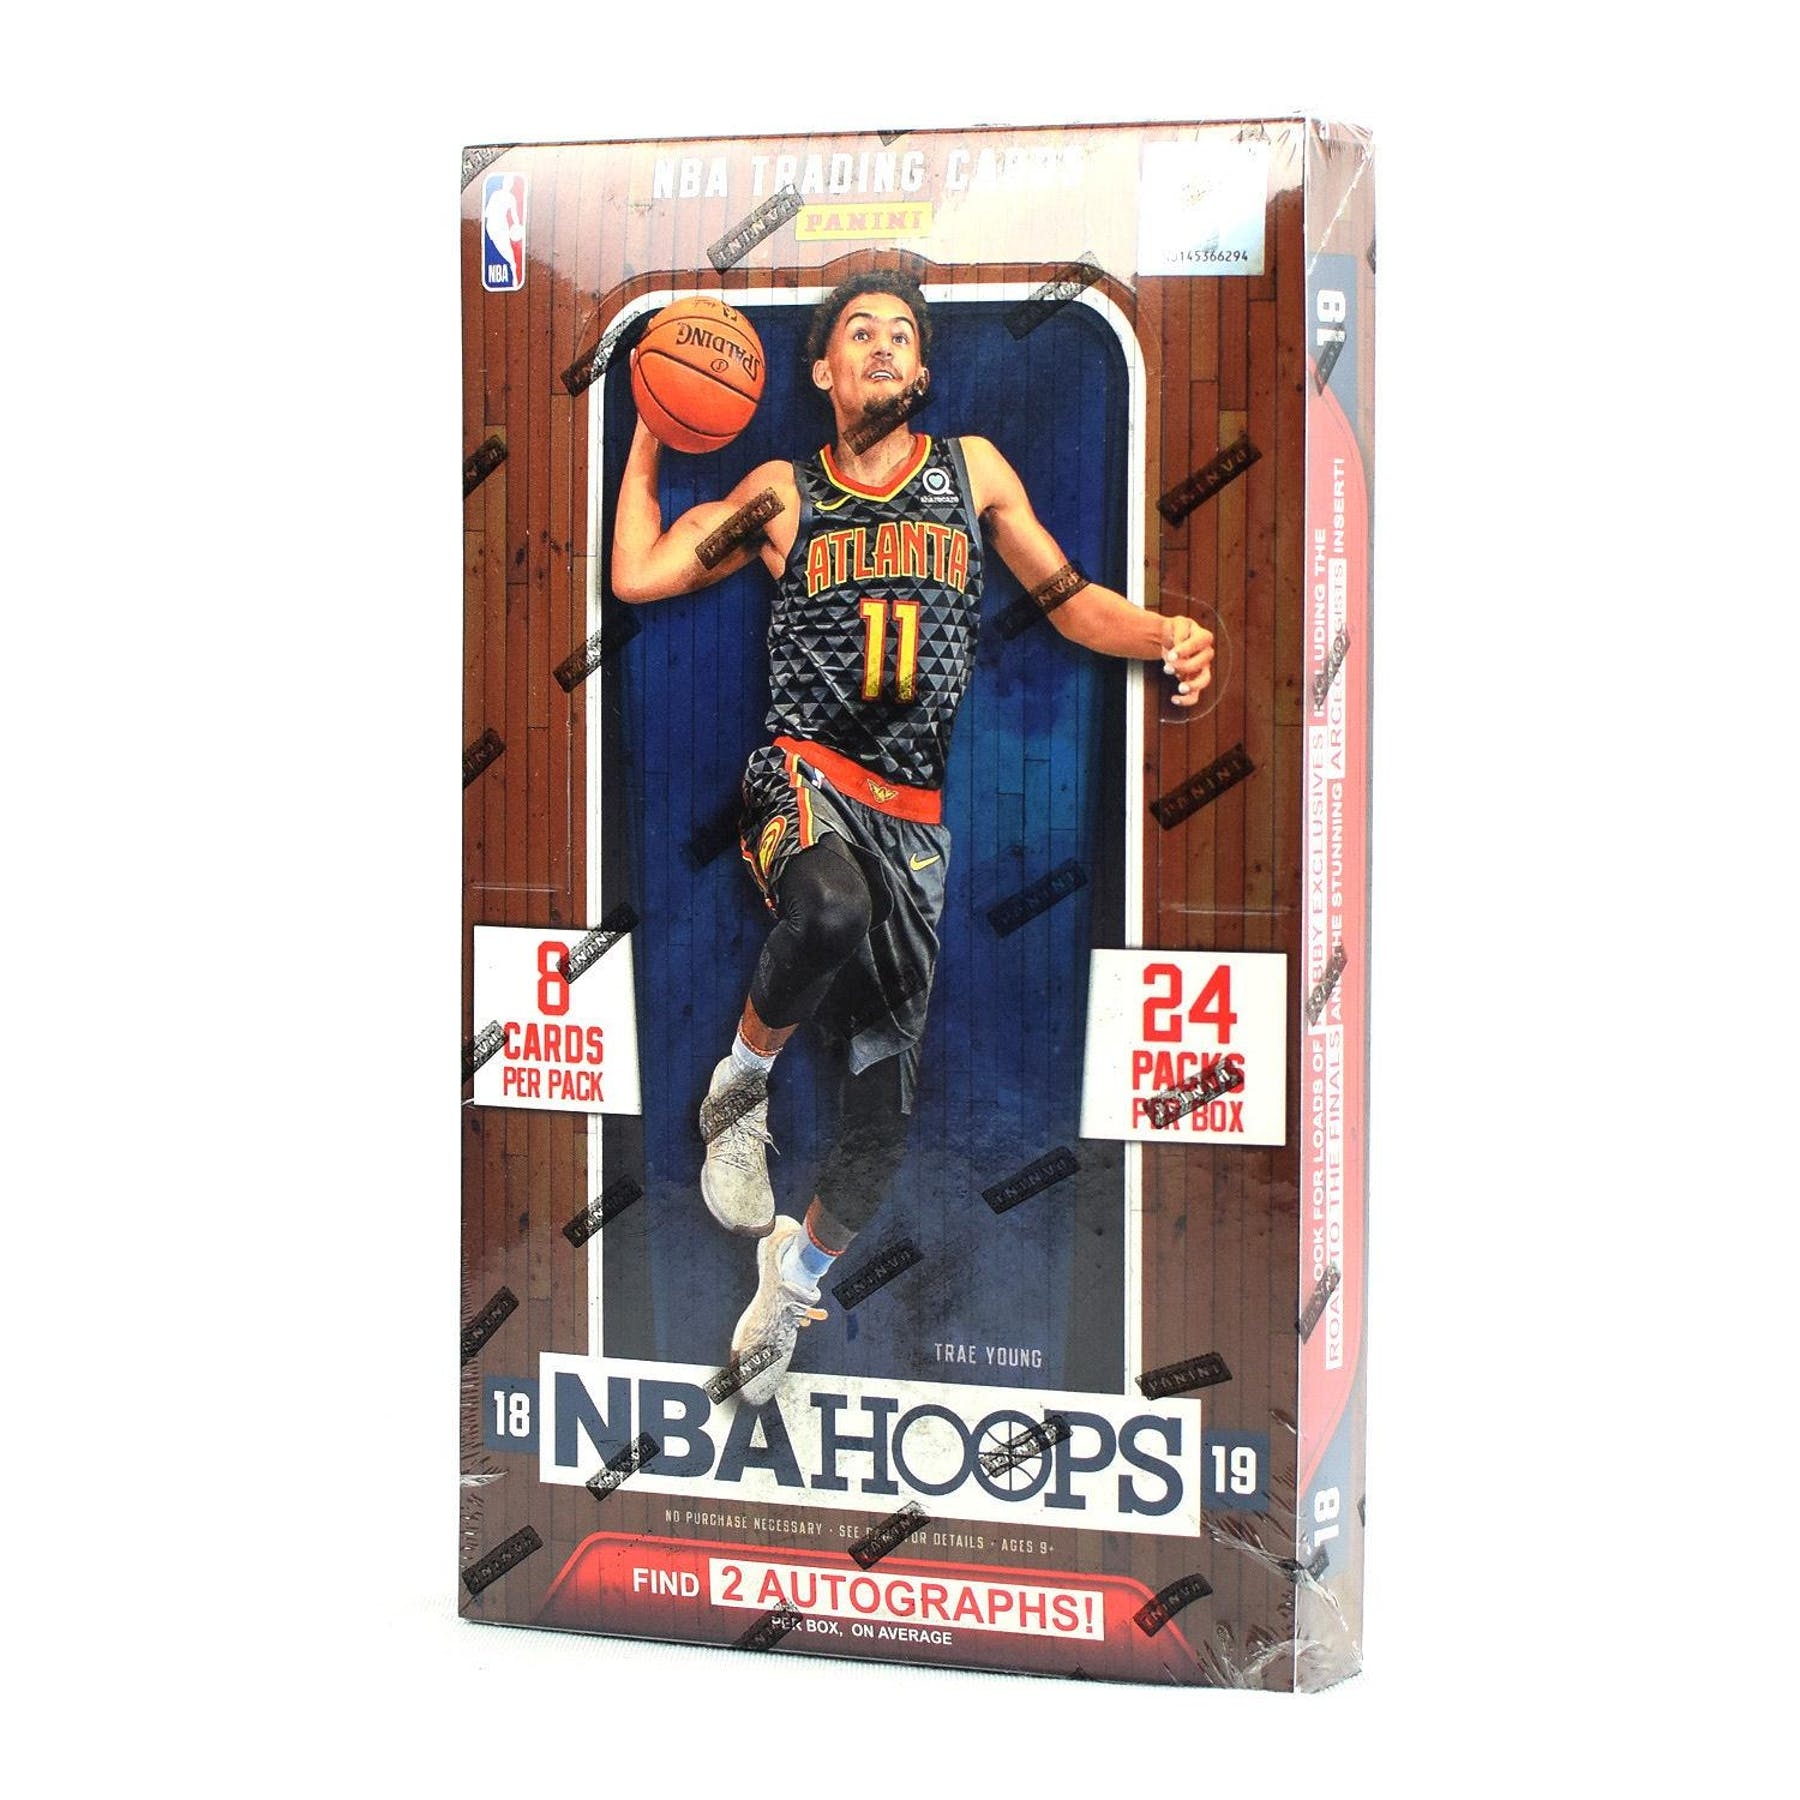 2018 19 Panini Nba Hoops Basketball Hobby Box: 2018/19 Panini Hoops Basketball Hobby Box